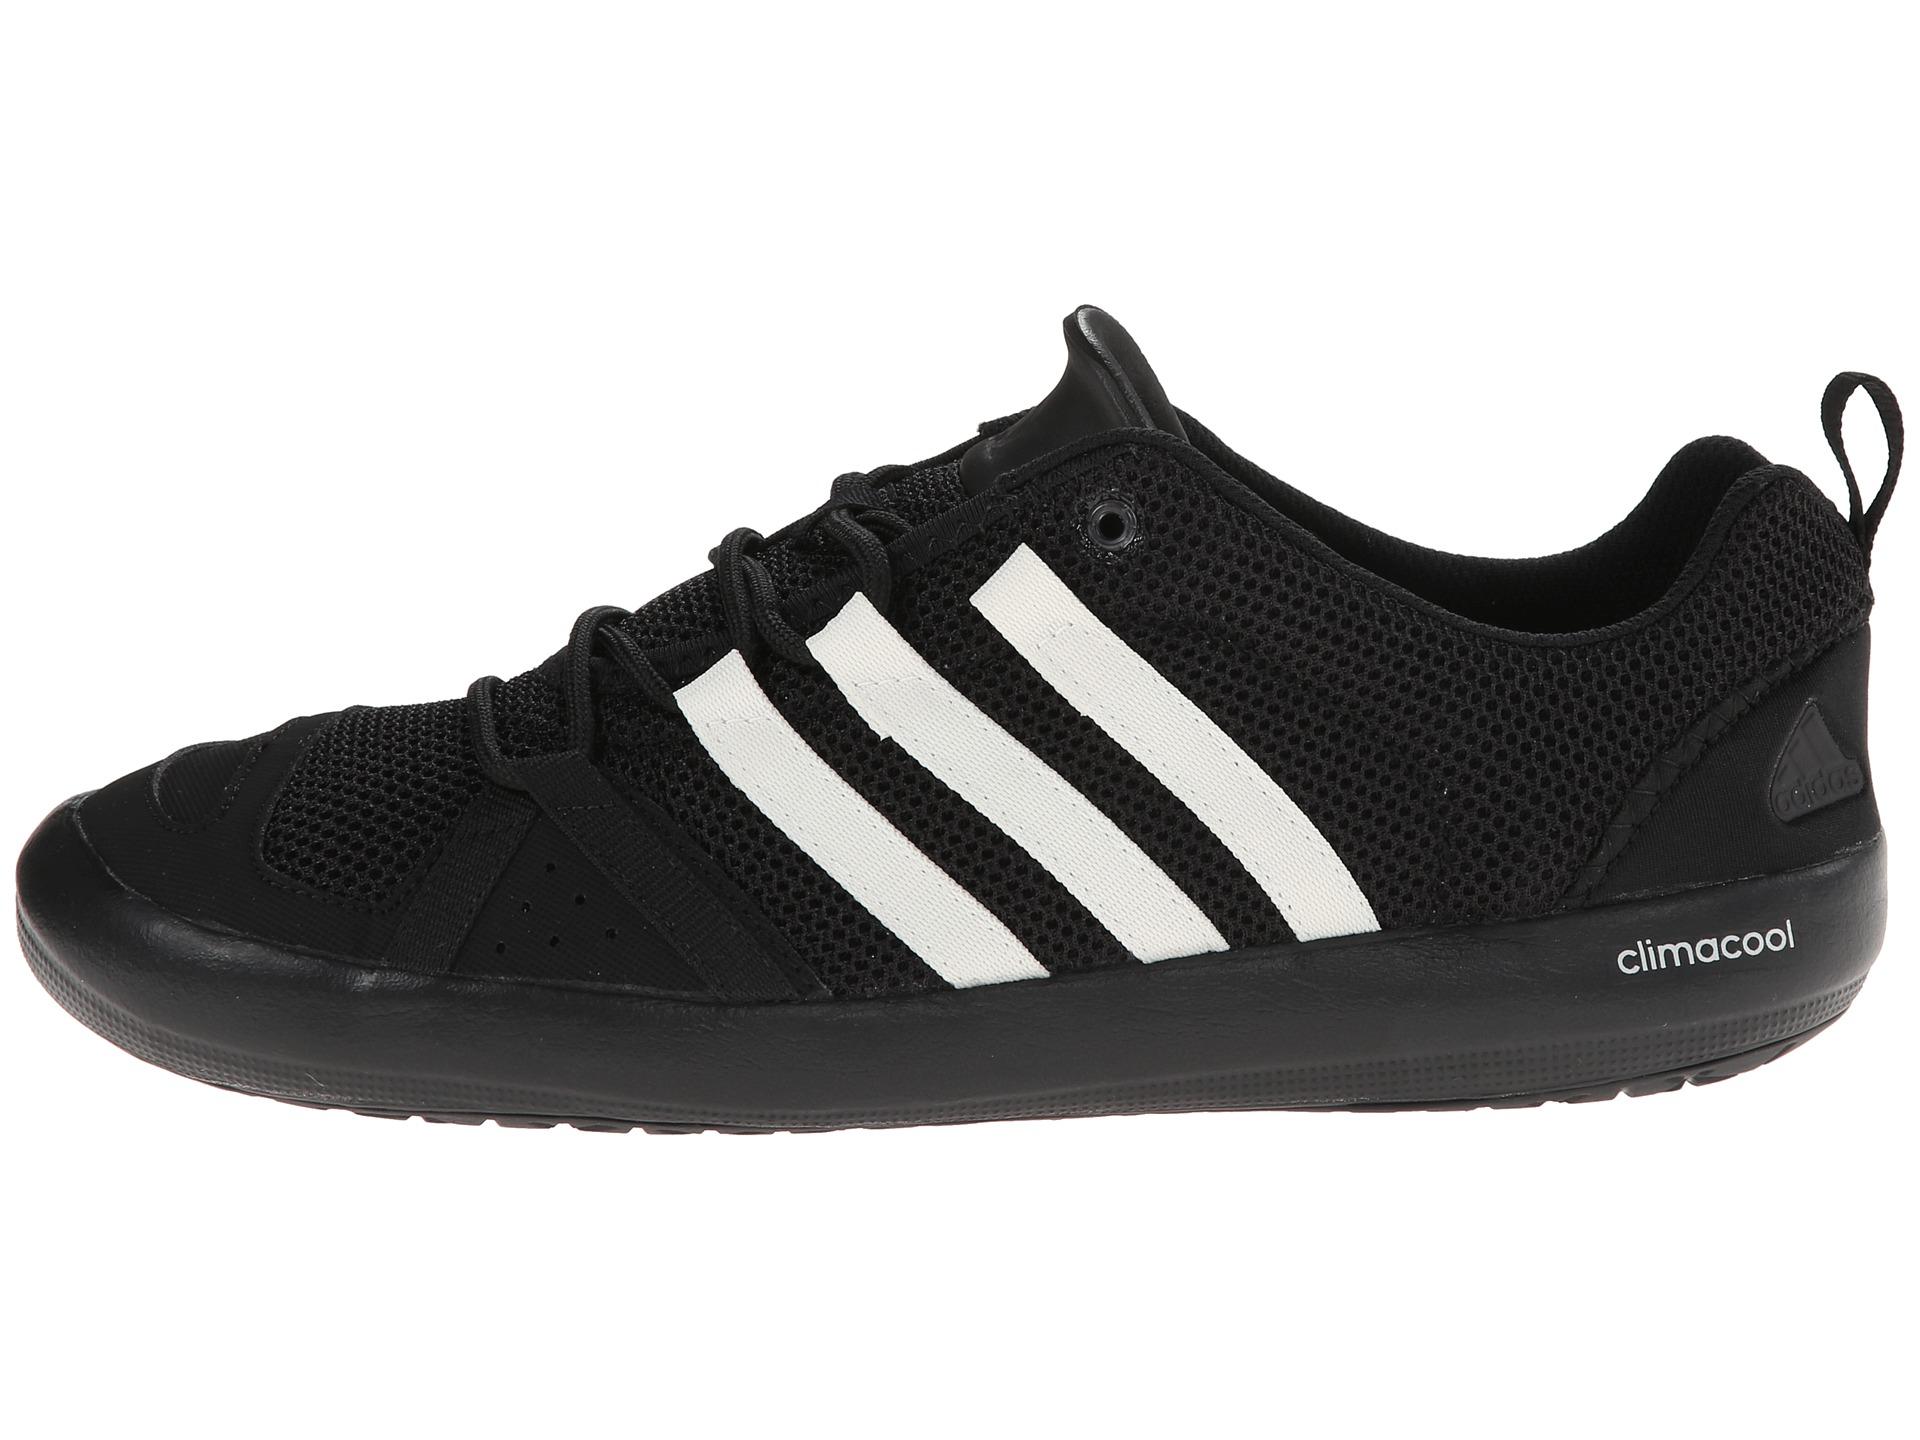 adidas boat shoes climacool